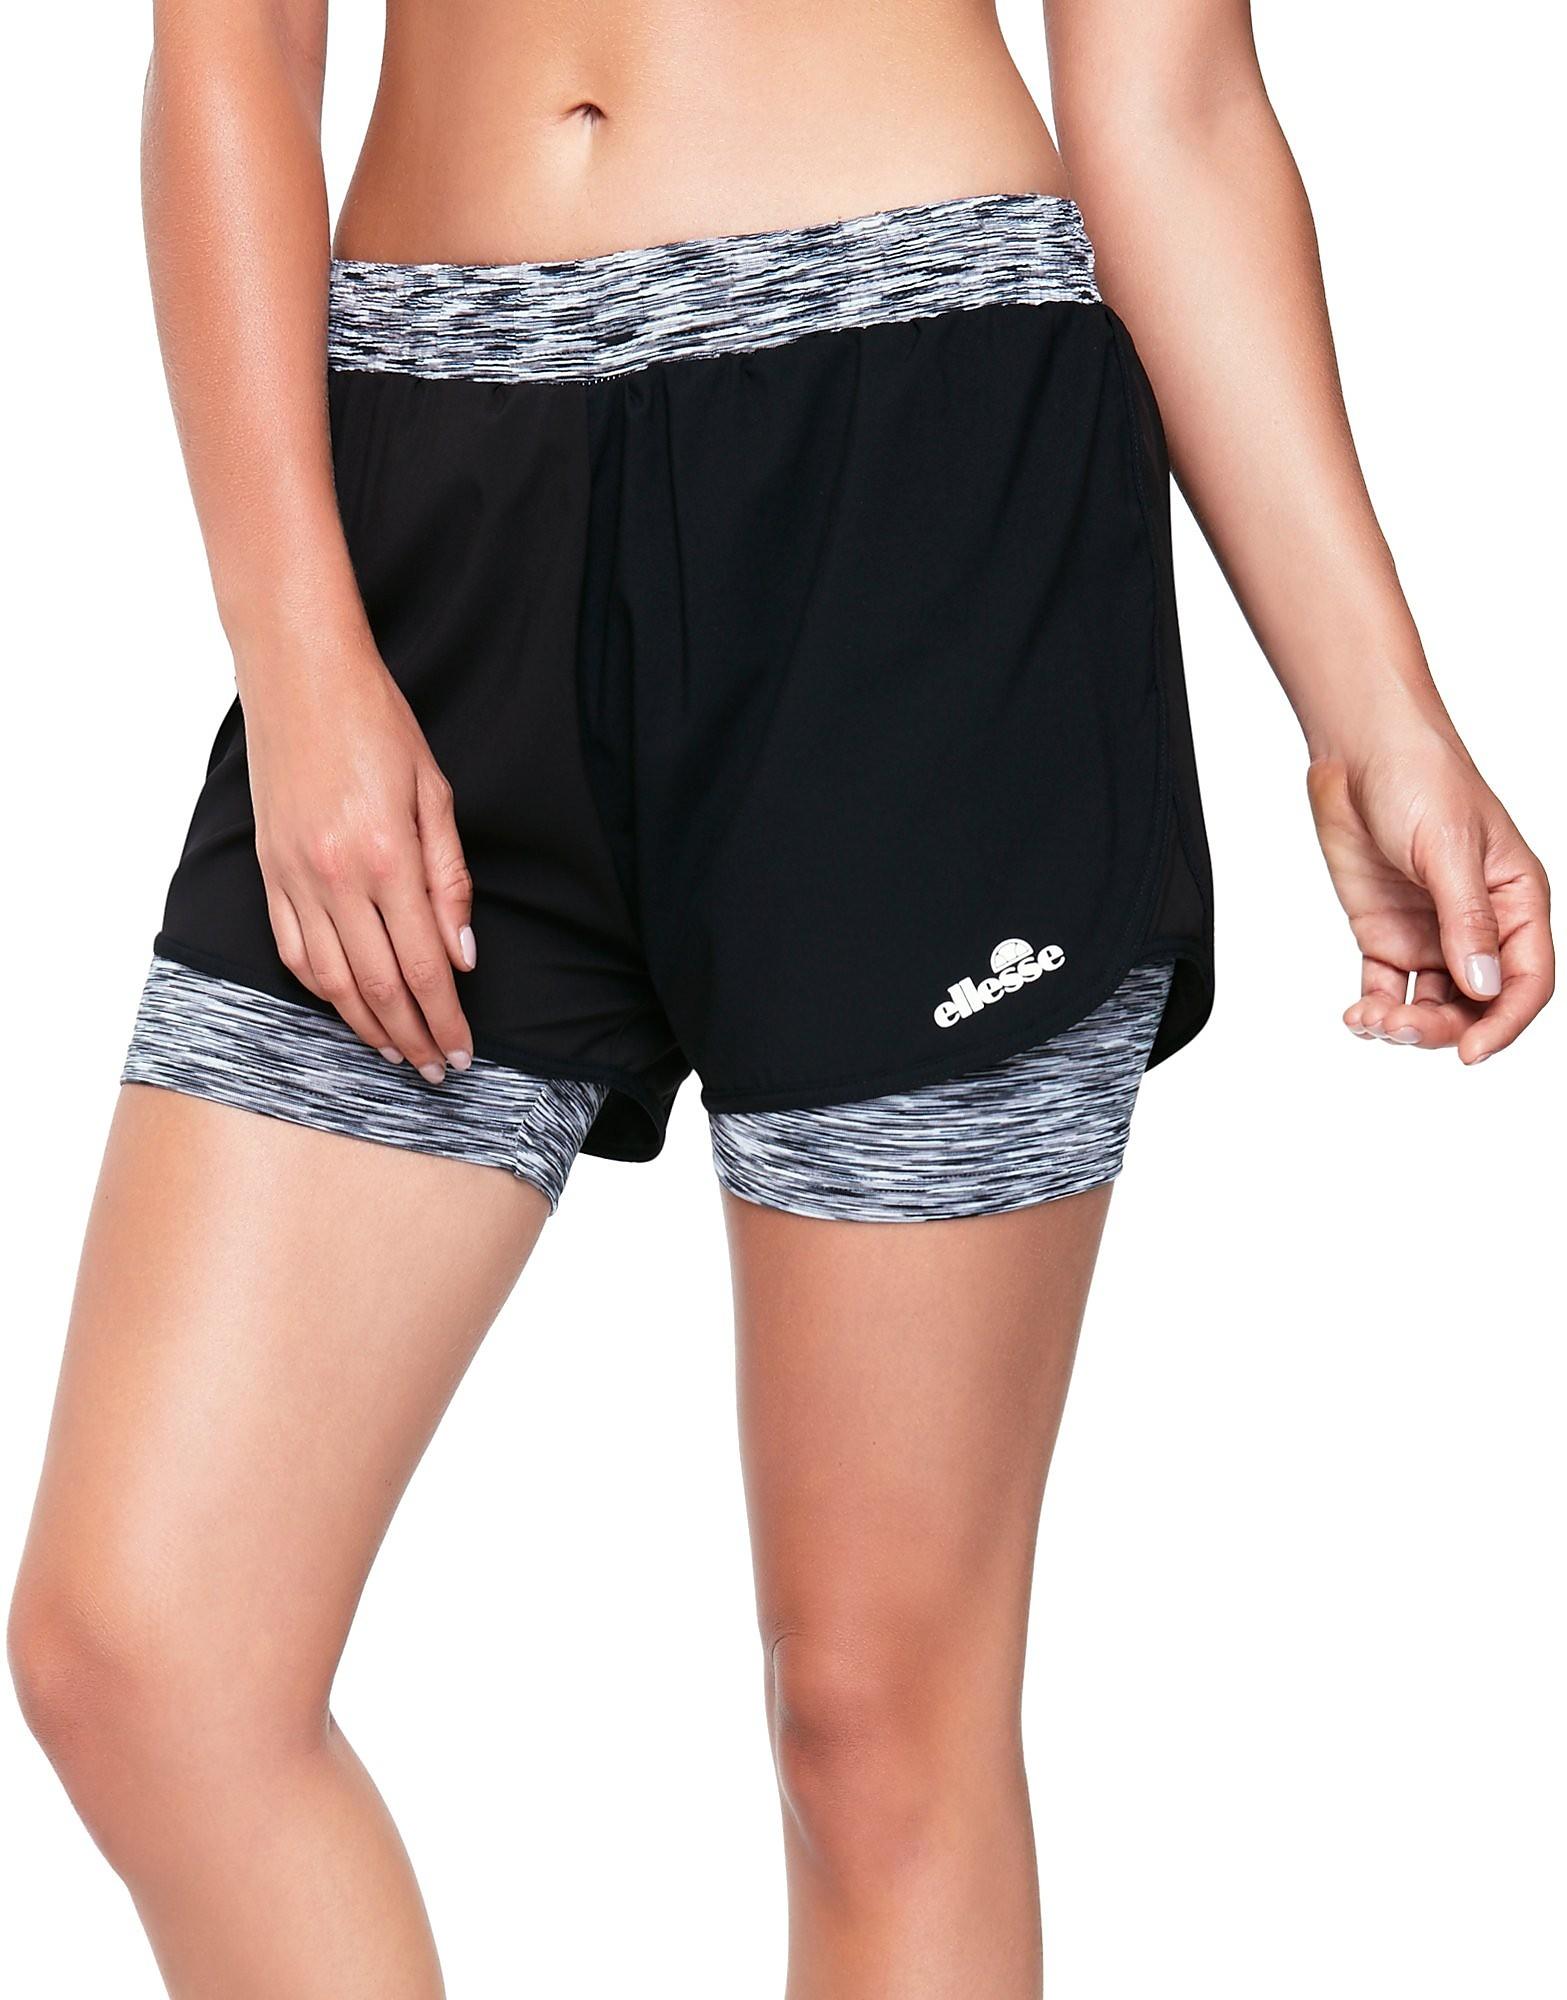 Ellesse Missy 2-In-1 Shorts